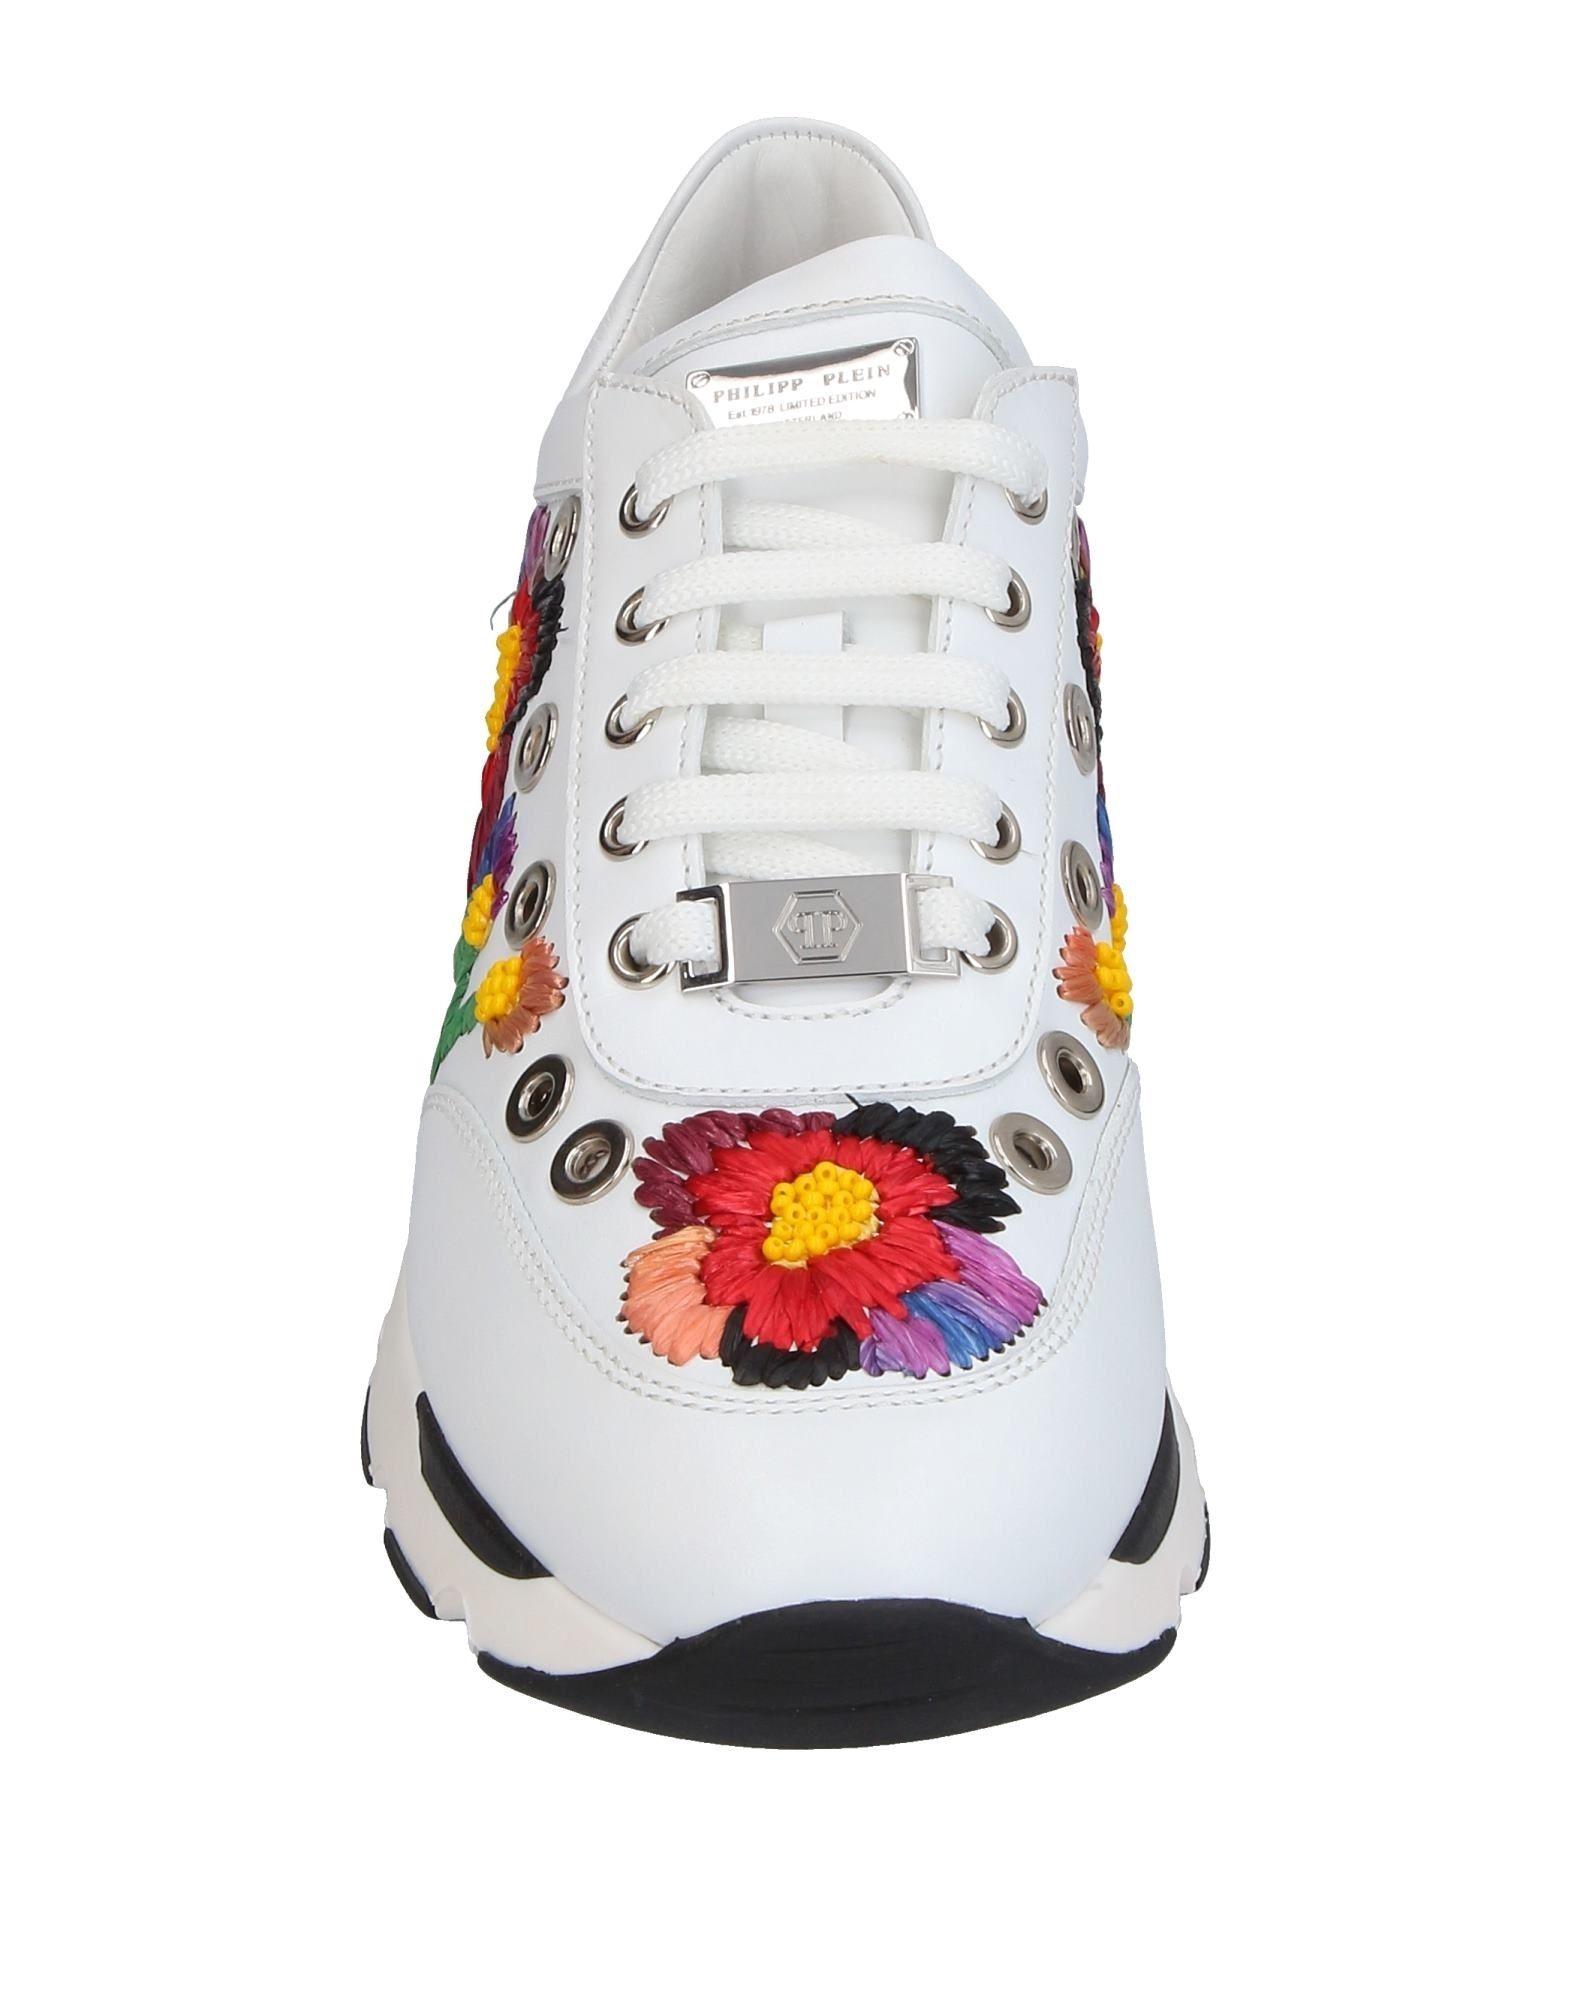 Sneakers Philipp Plein Femme - Sneakers Philipp Plein sur